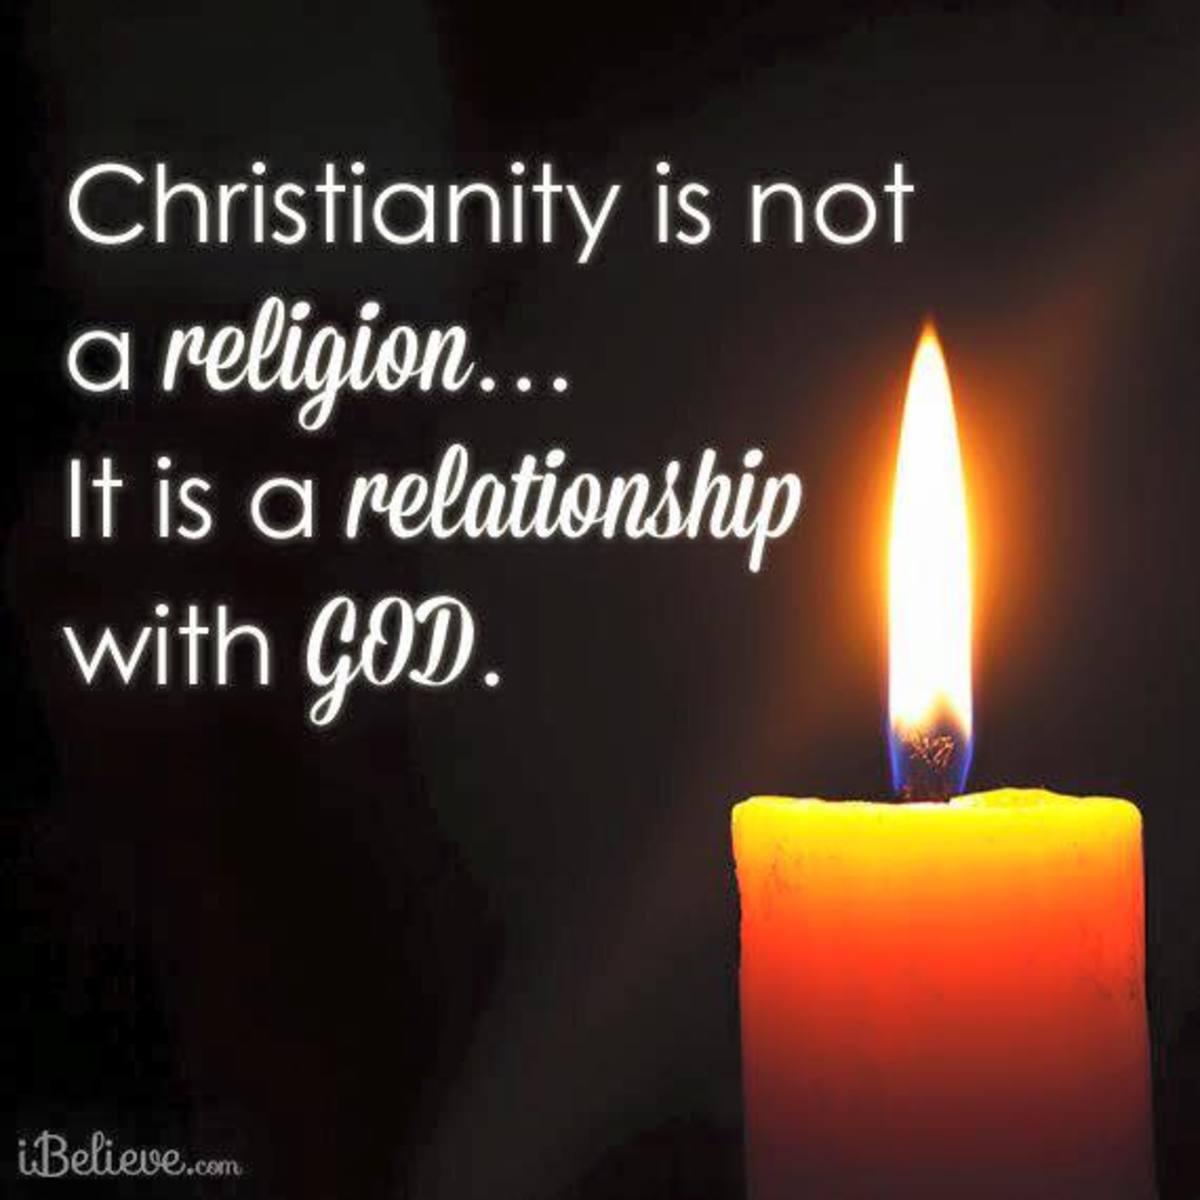 Prosperity Preachers and Organized Religion